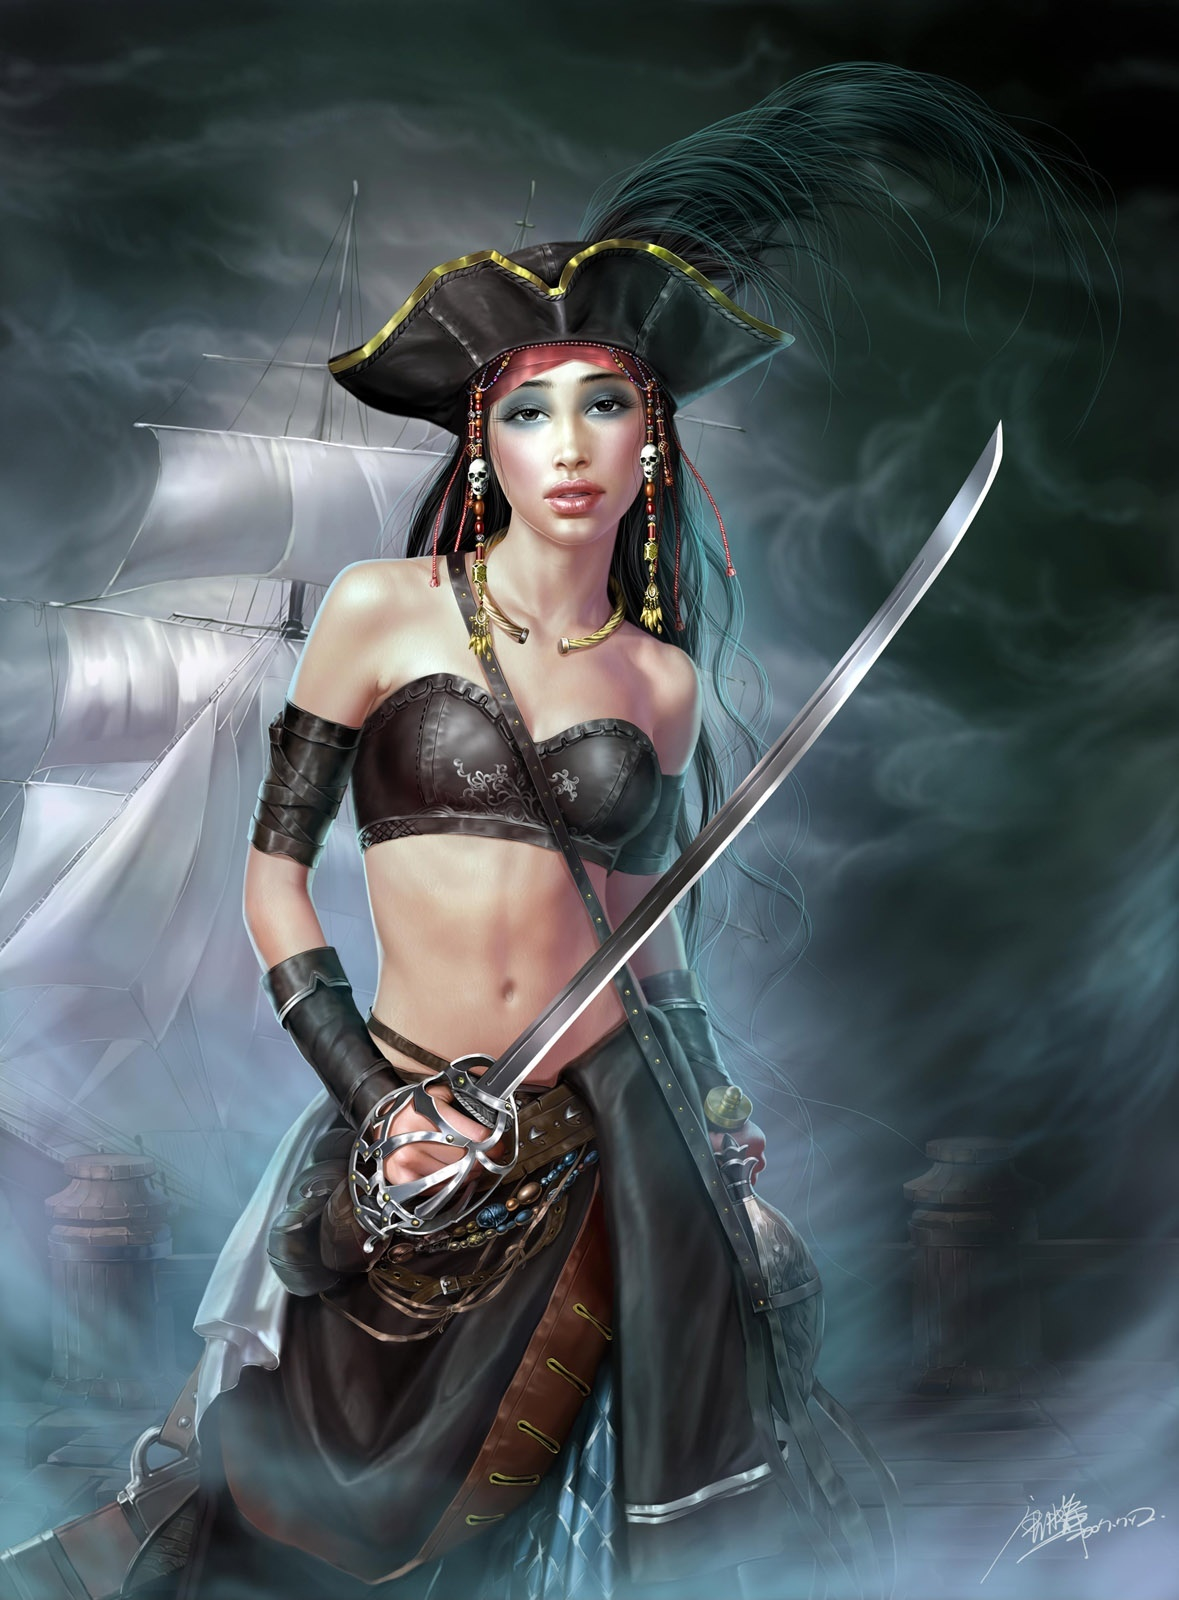 Sztyh female pirates 1 355cd5ed v8lp